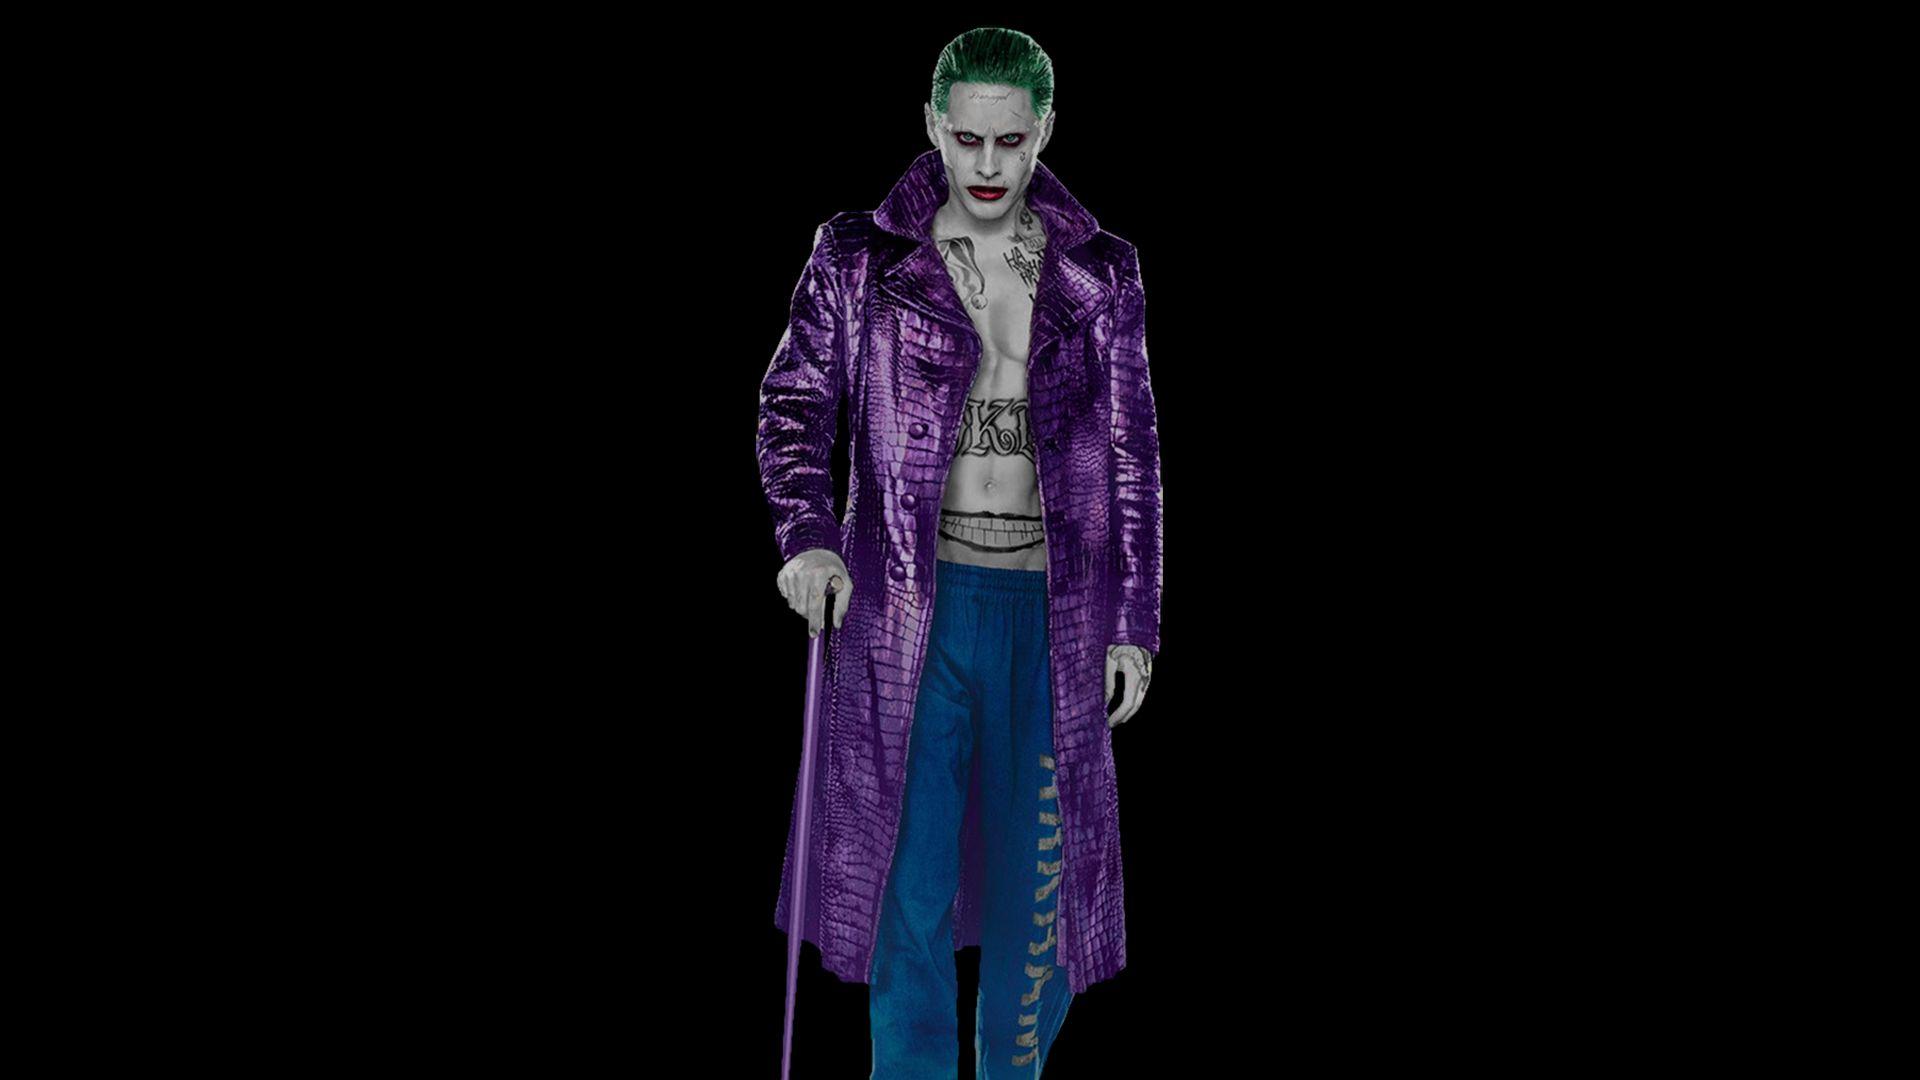 Suicide Squad Joker, Free Desktop Wallpaper